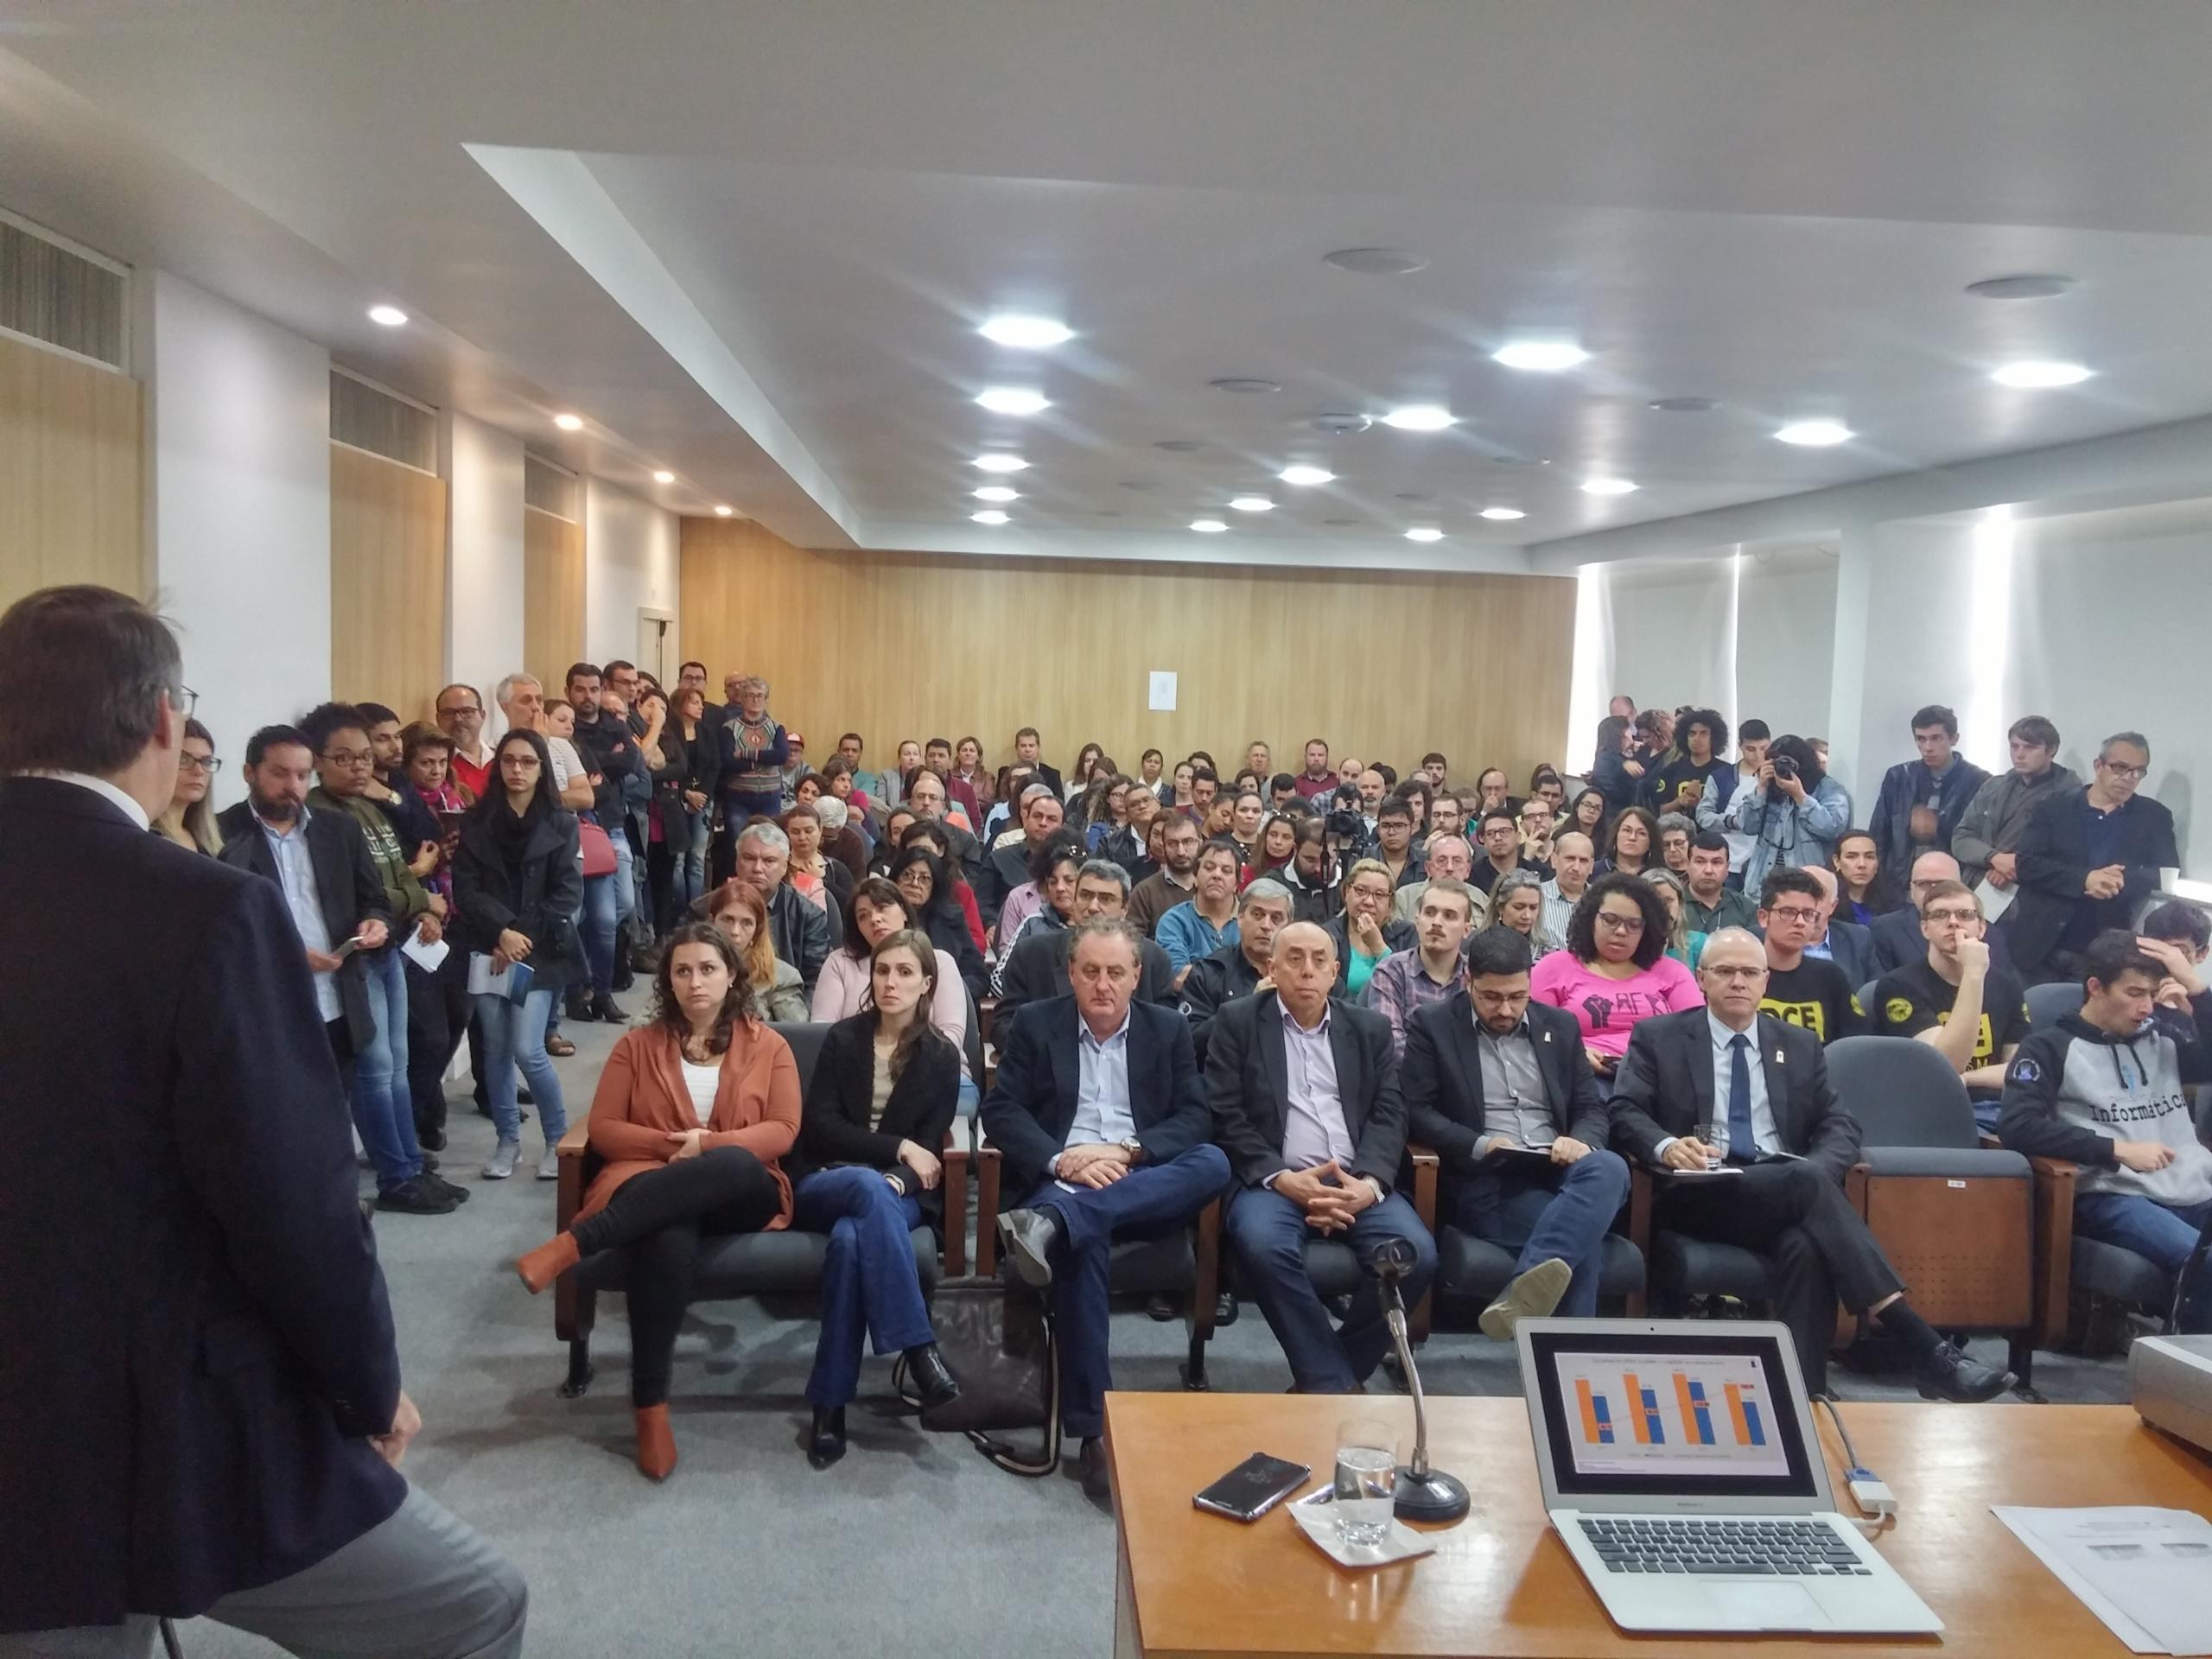 2017 09 15 Audiência Pública UFSM 1